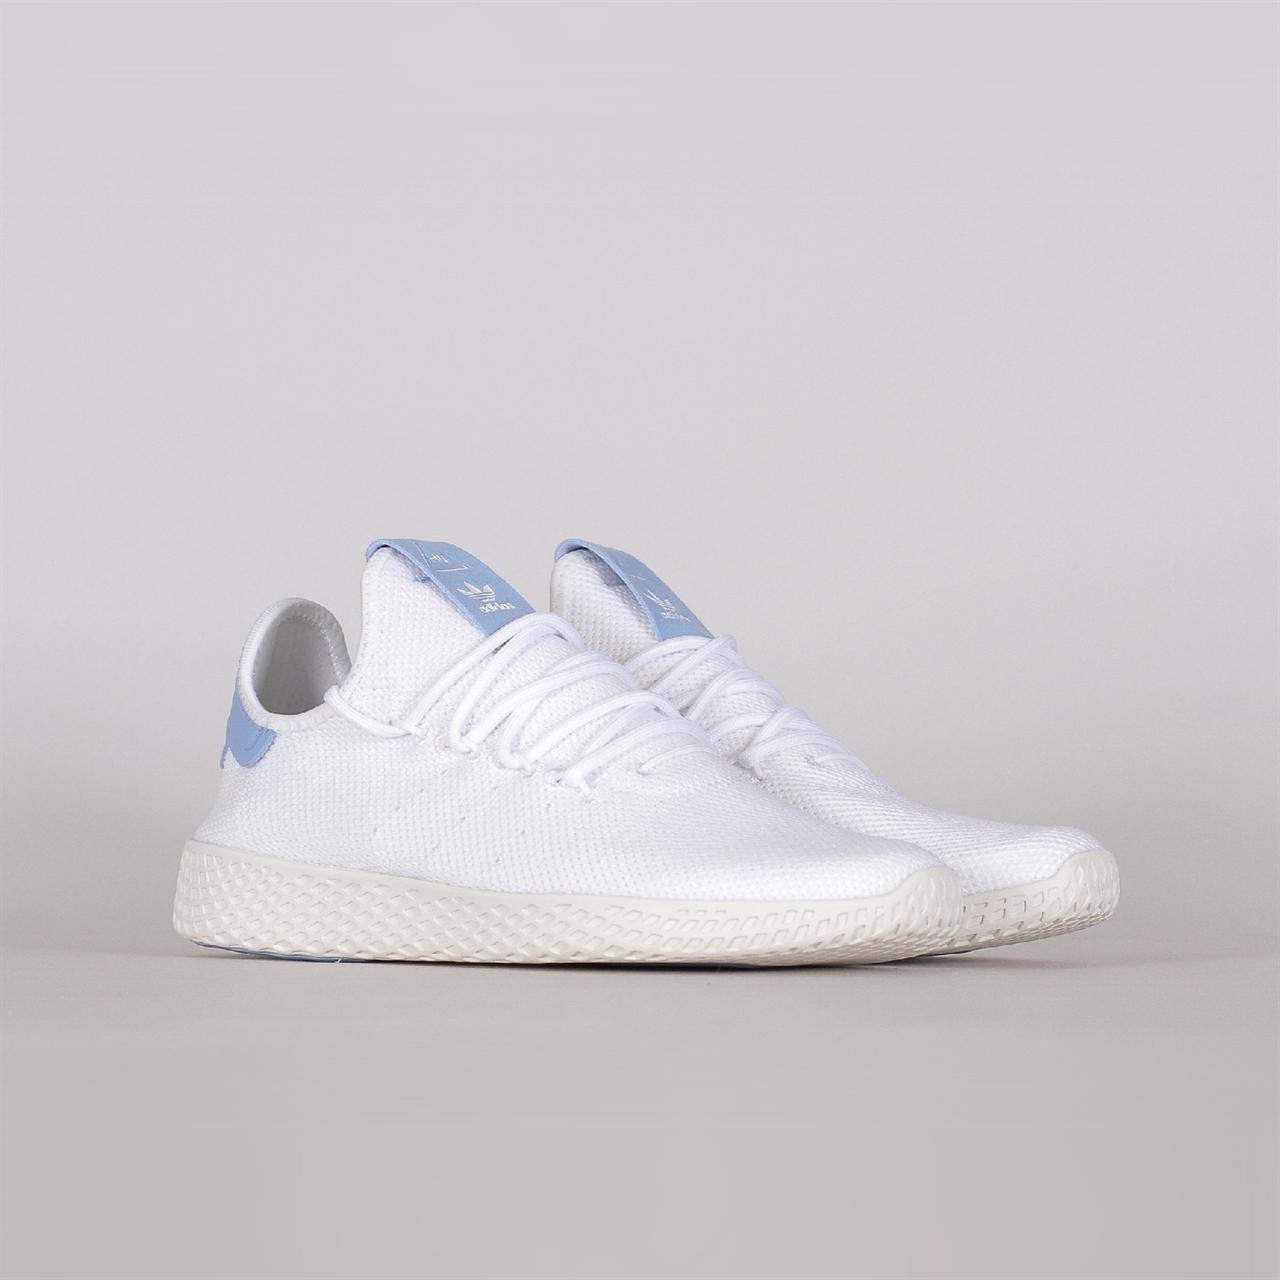 93b1524c105cb Shelta - Adidas Originals x Pharrell Williams Tennis HU (CQ2167)